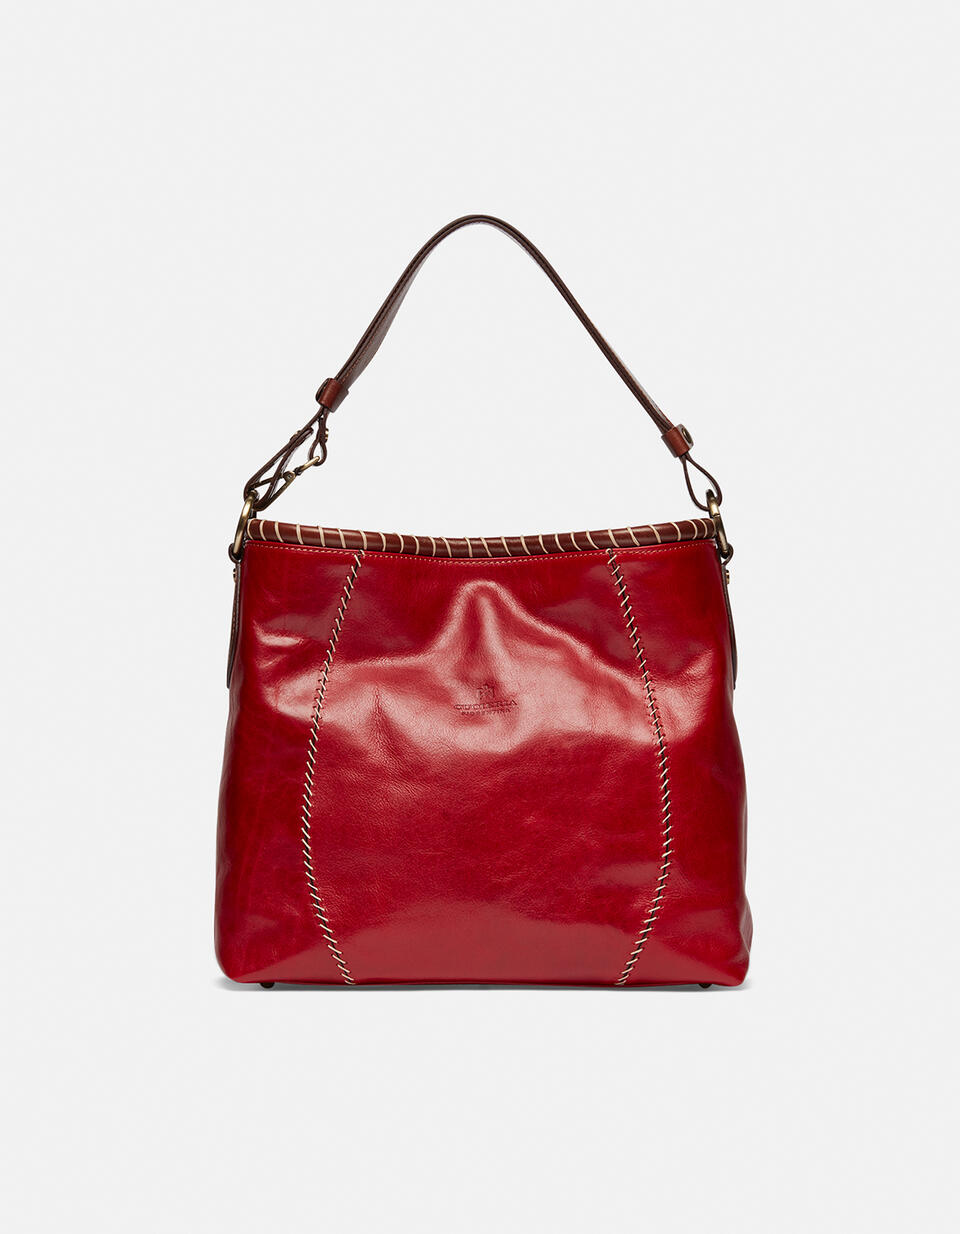 Warm and Colour hand-stitched shoulder bag ROSSOBICOLORE Cuoieria Fiorentina